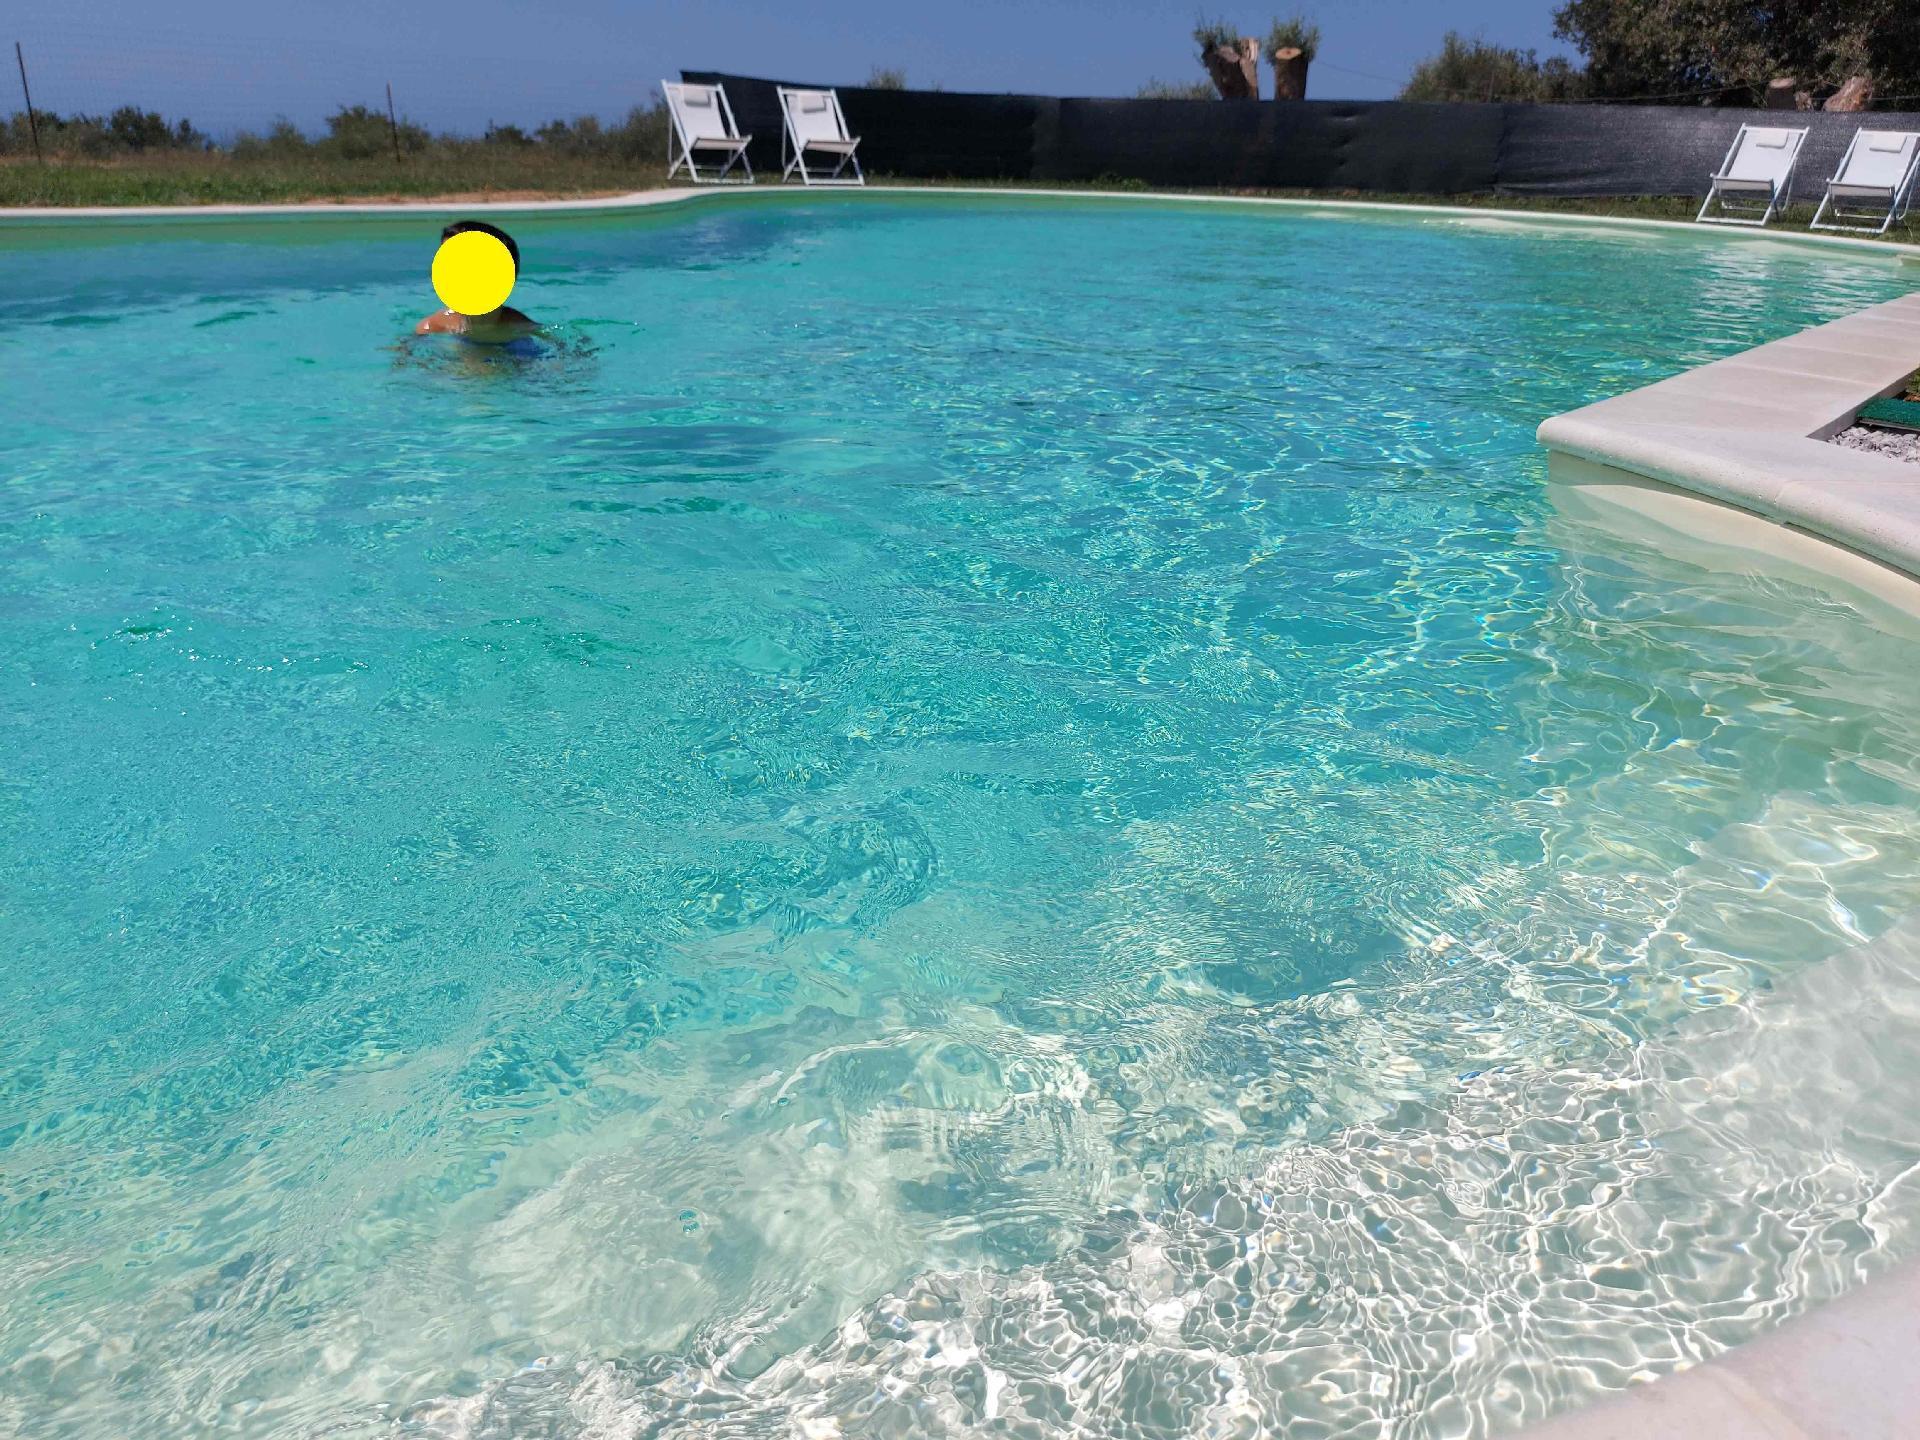 Unabhängige Villa mit Gartenpool Nahe dem Mee